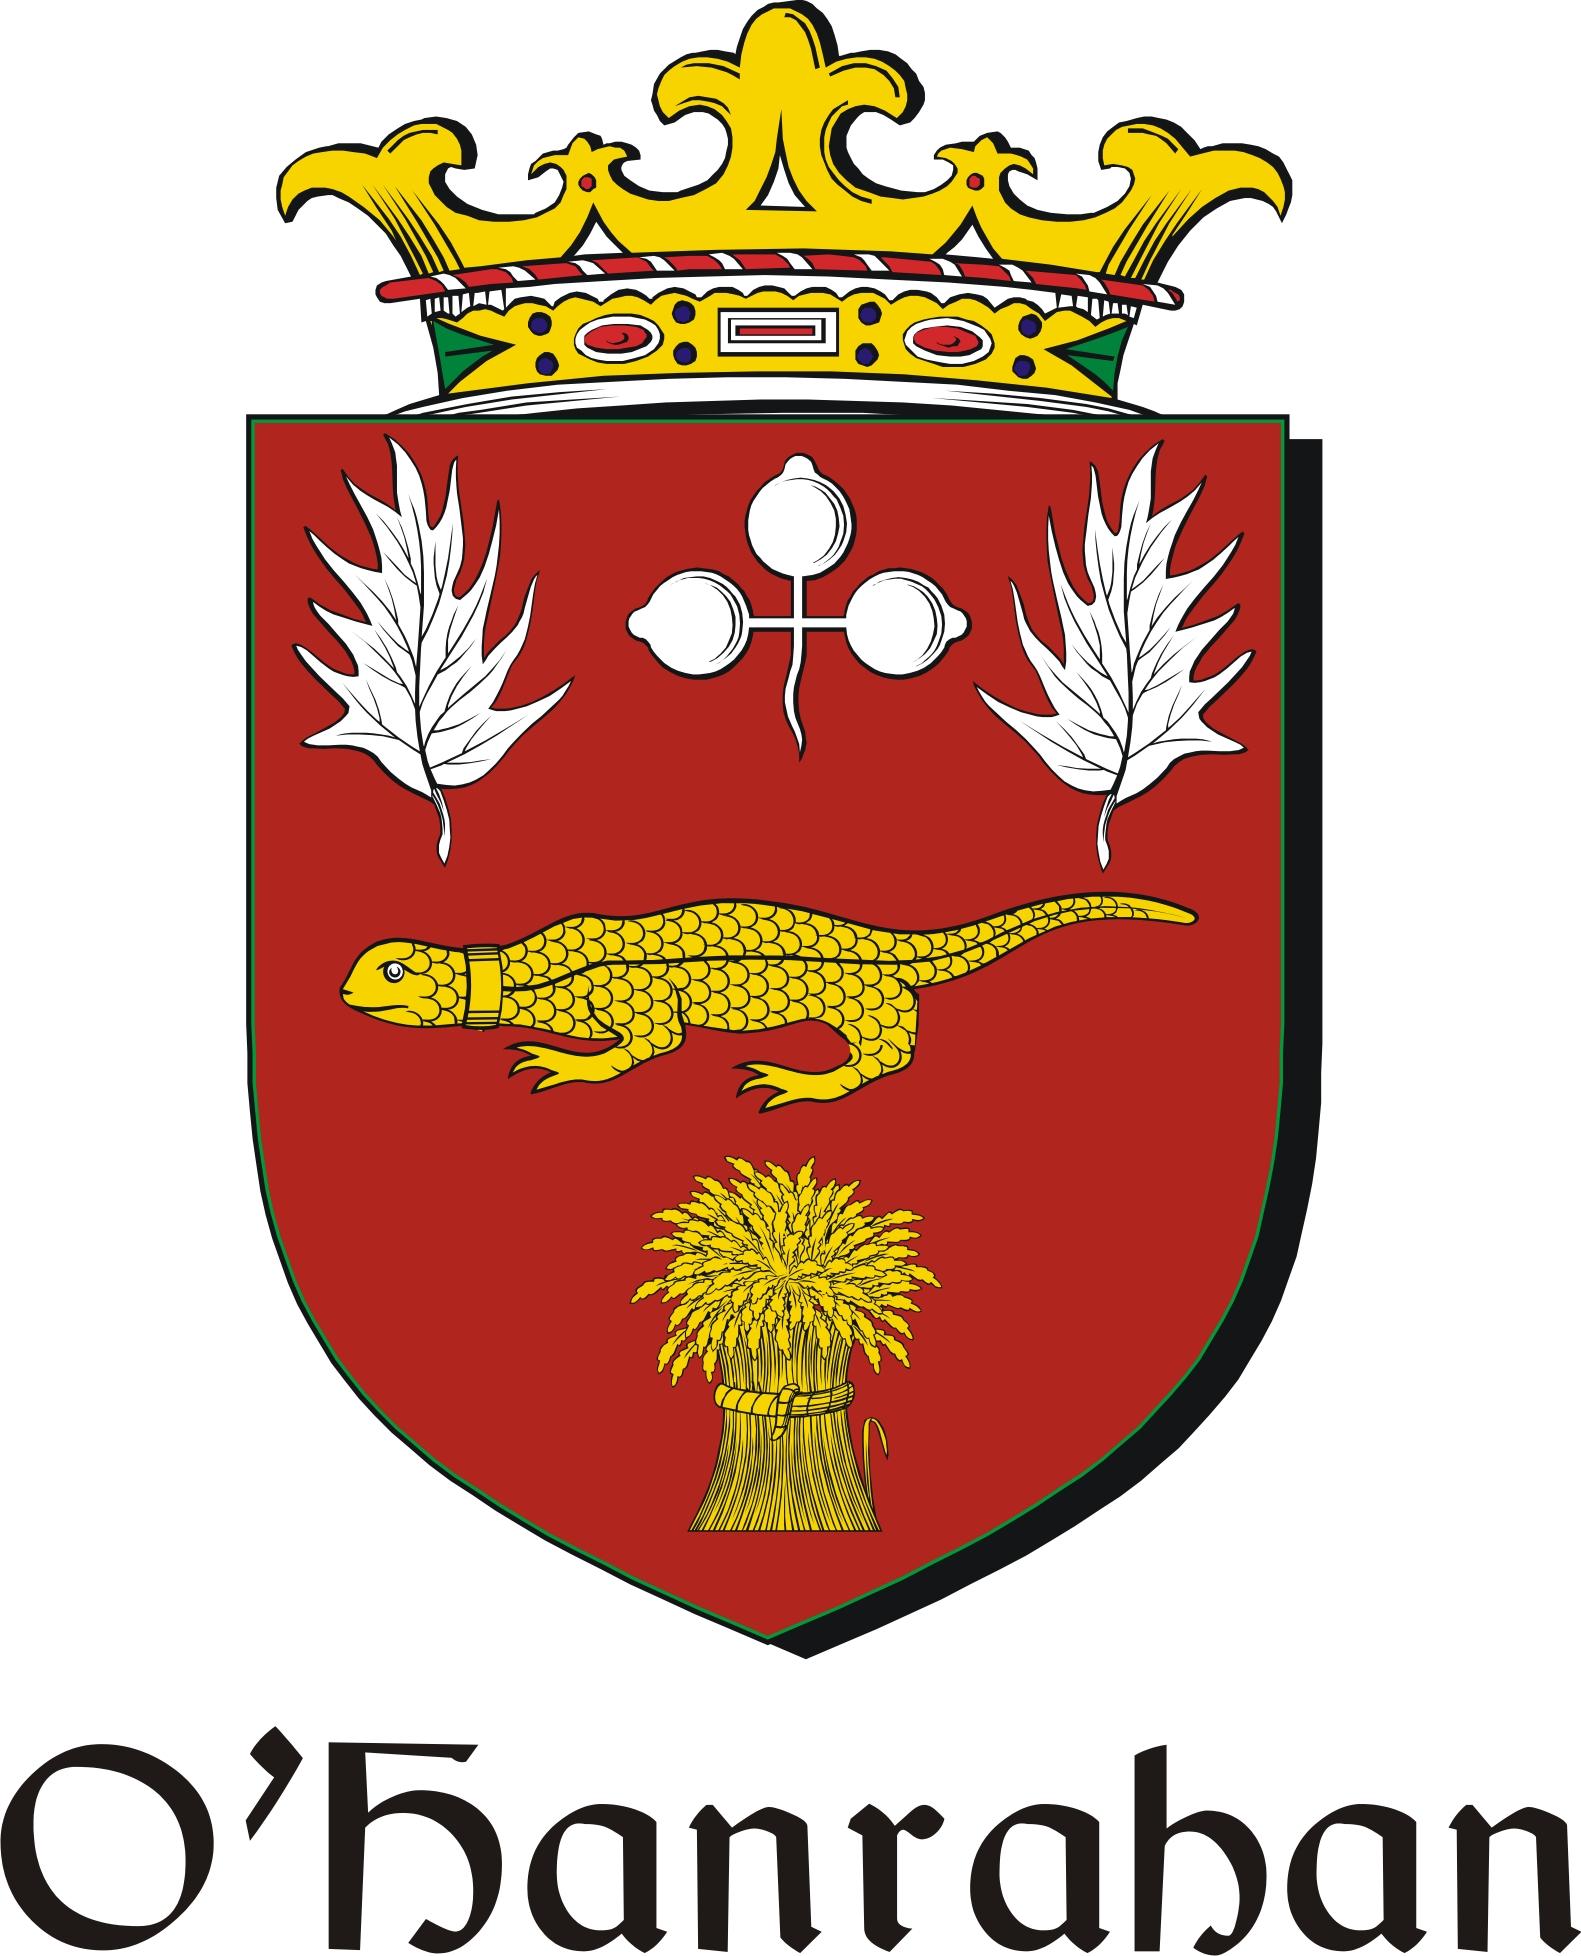 Thumbnail Hanrahan-O Family Crest / Irish Coat of Arms Image Download